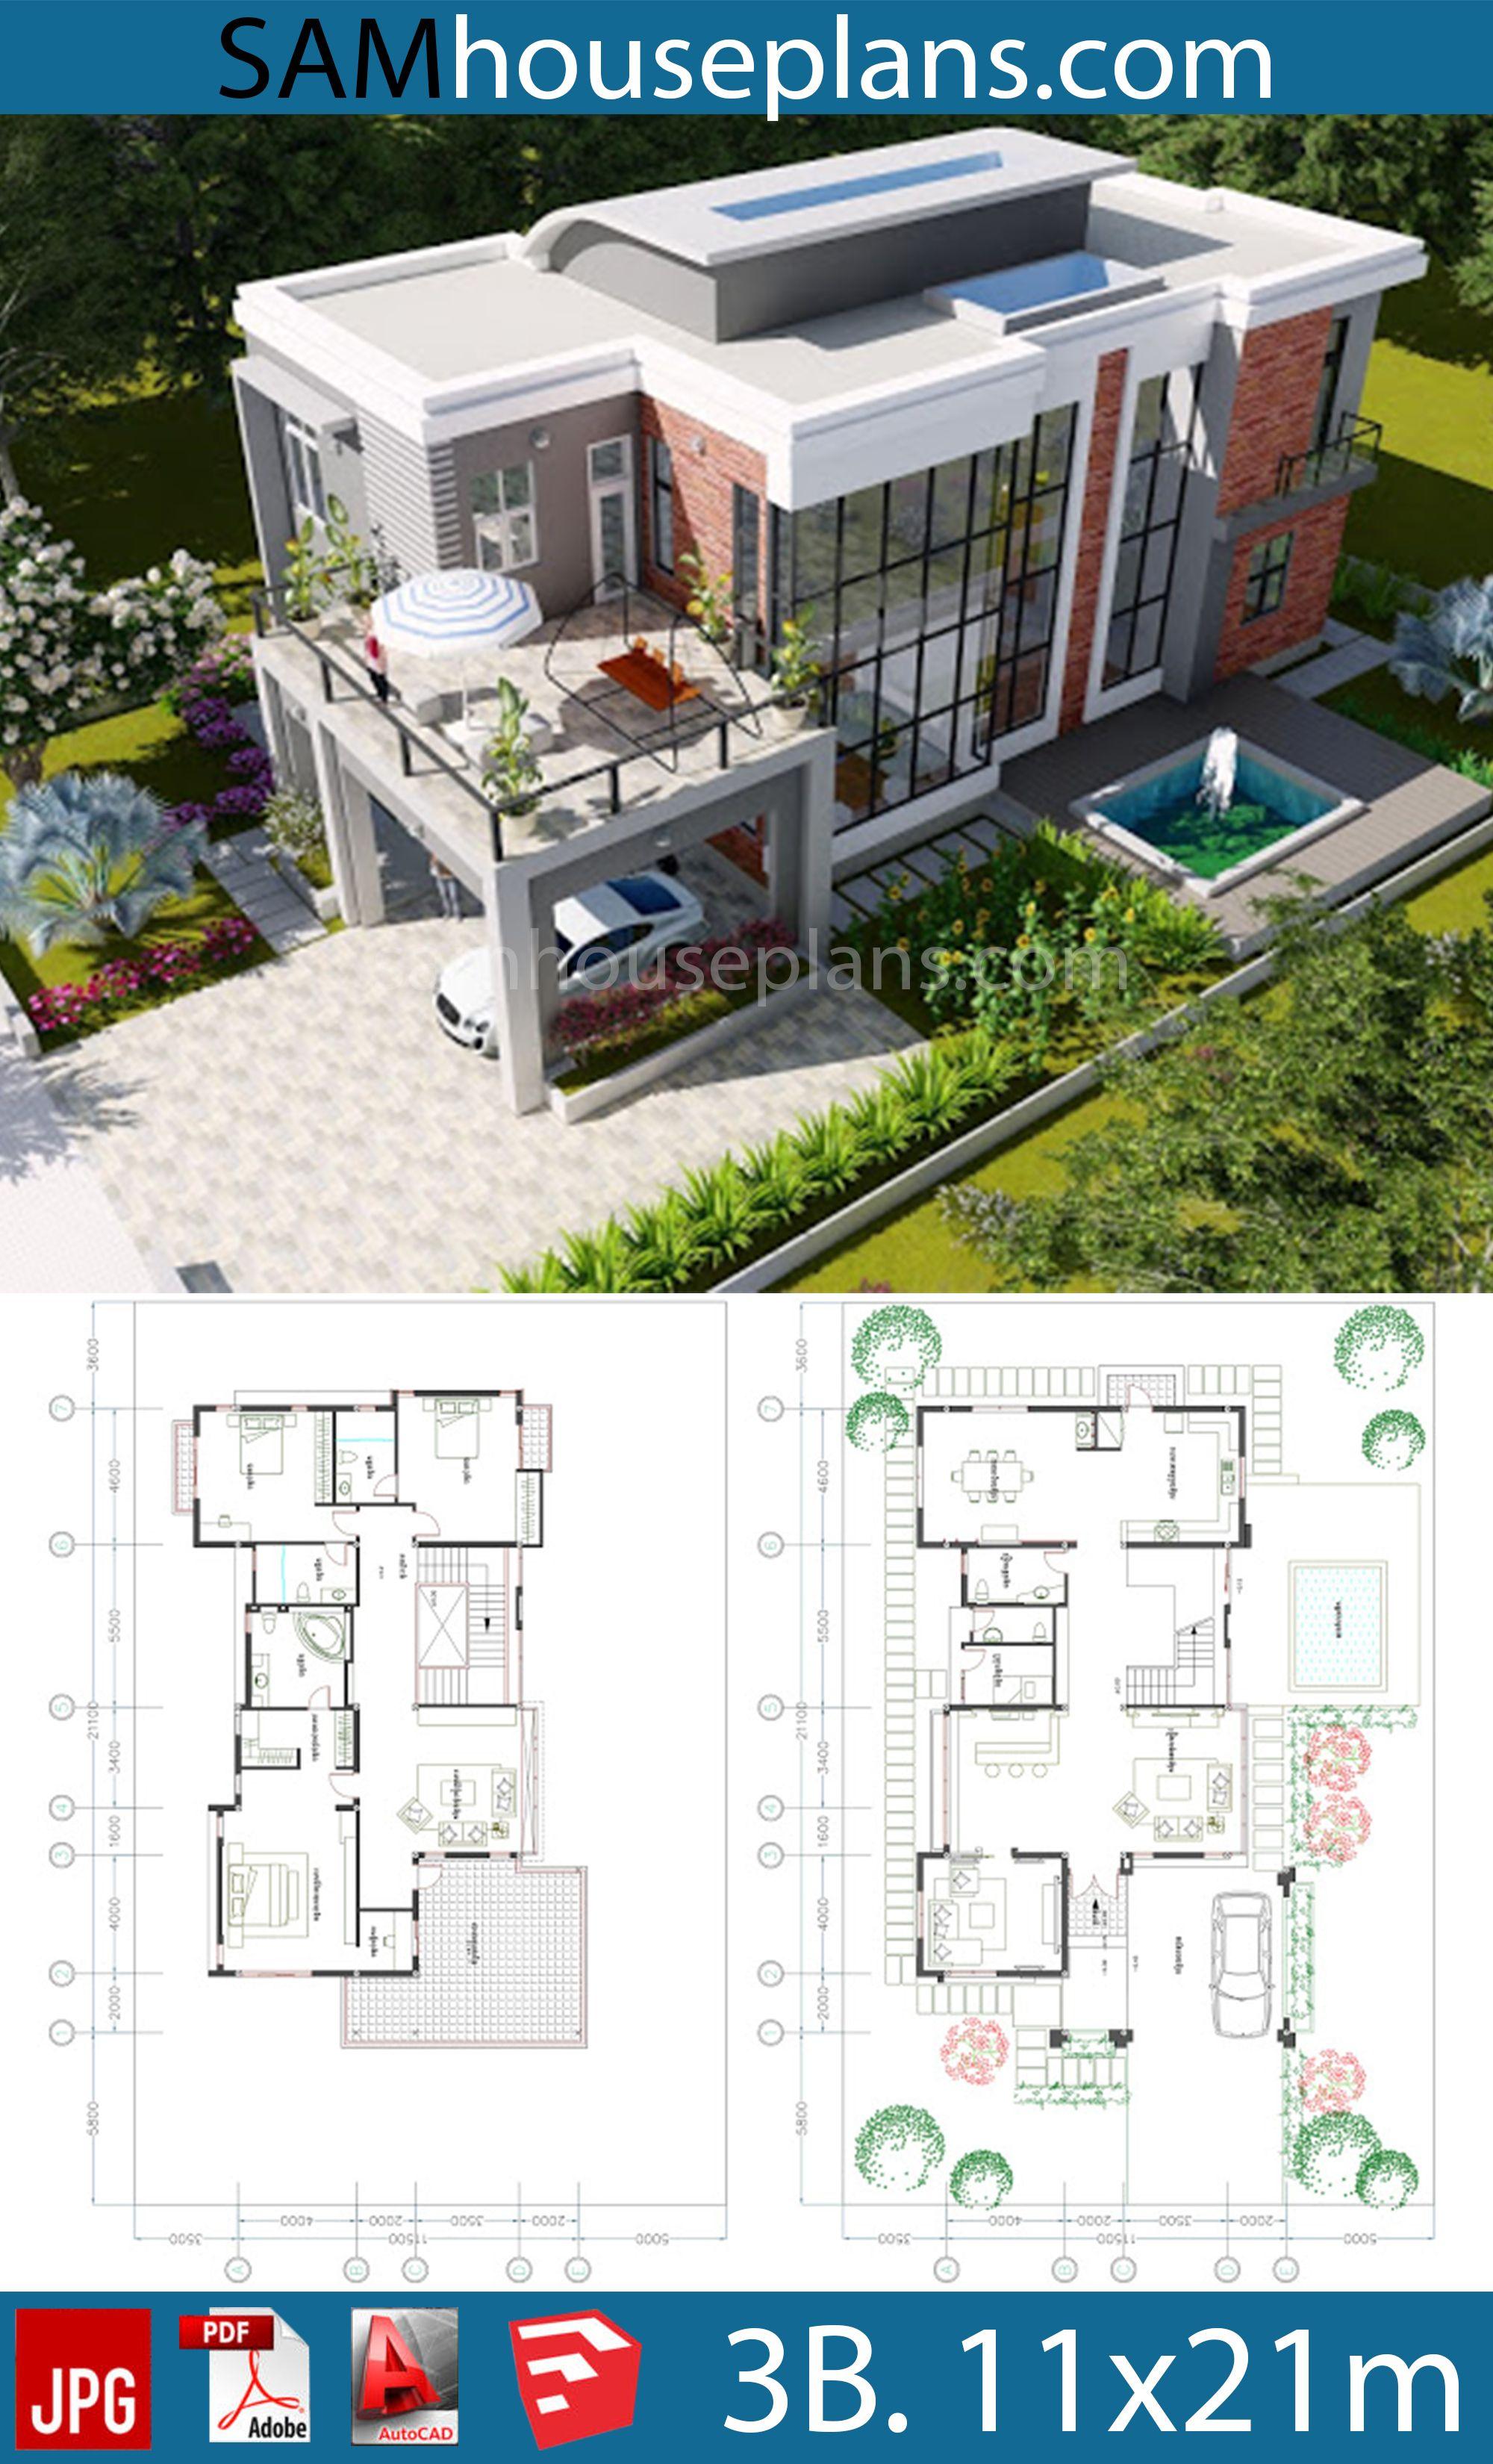 House Plans 11 5x21 1m With 3 Bedrooms House Plans S Architecture Model House Modern Villa Design Sims House Plans